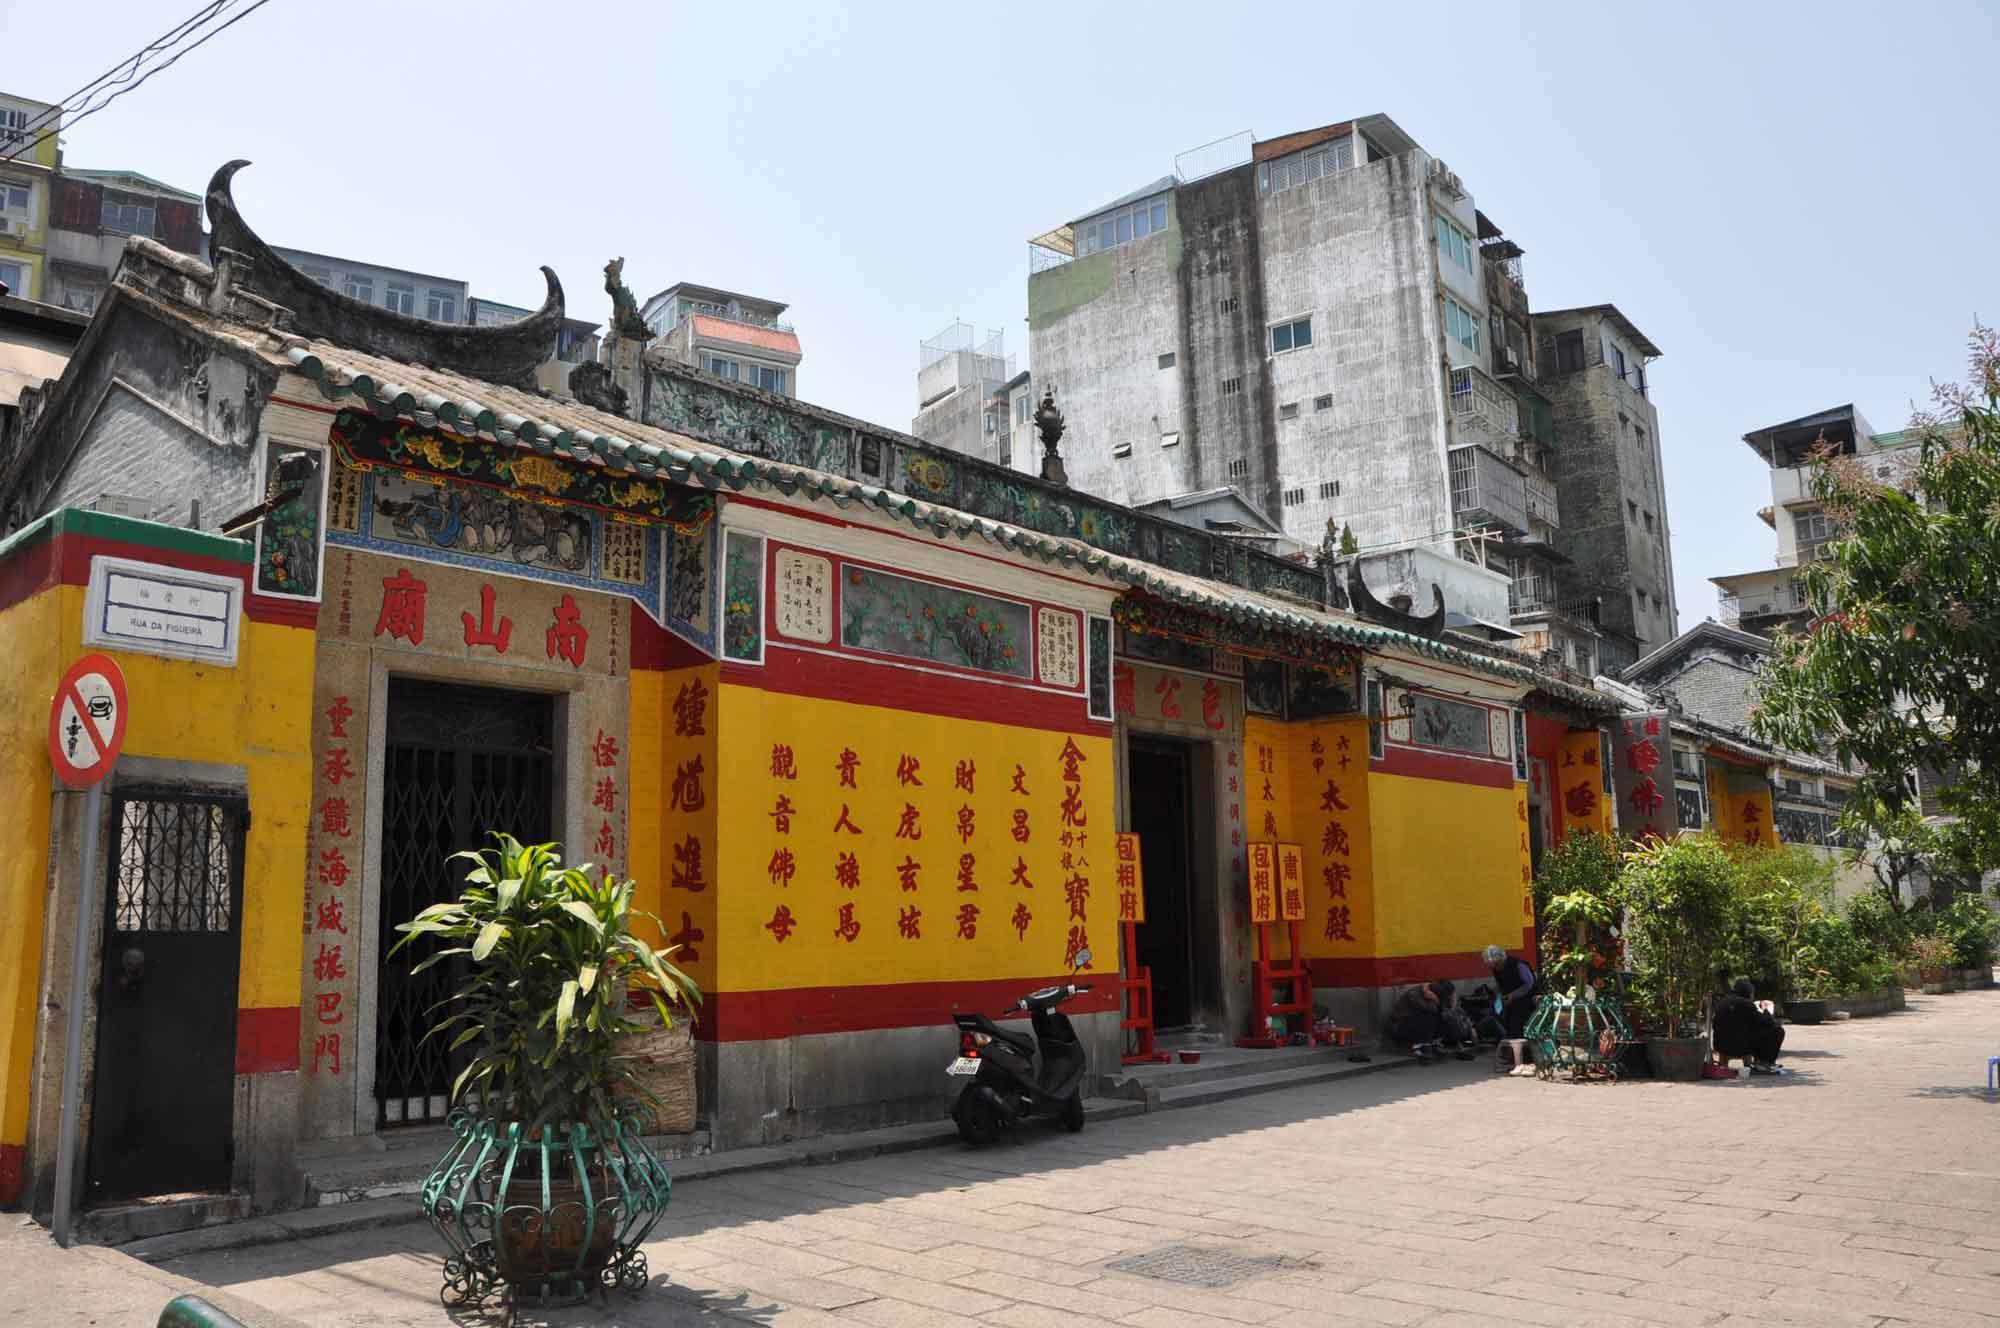 Macau Camoes Park Temples: Tai Soi(Temple of Sleeping Buddha)